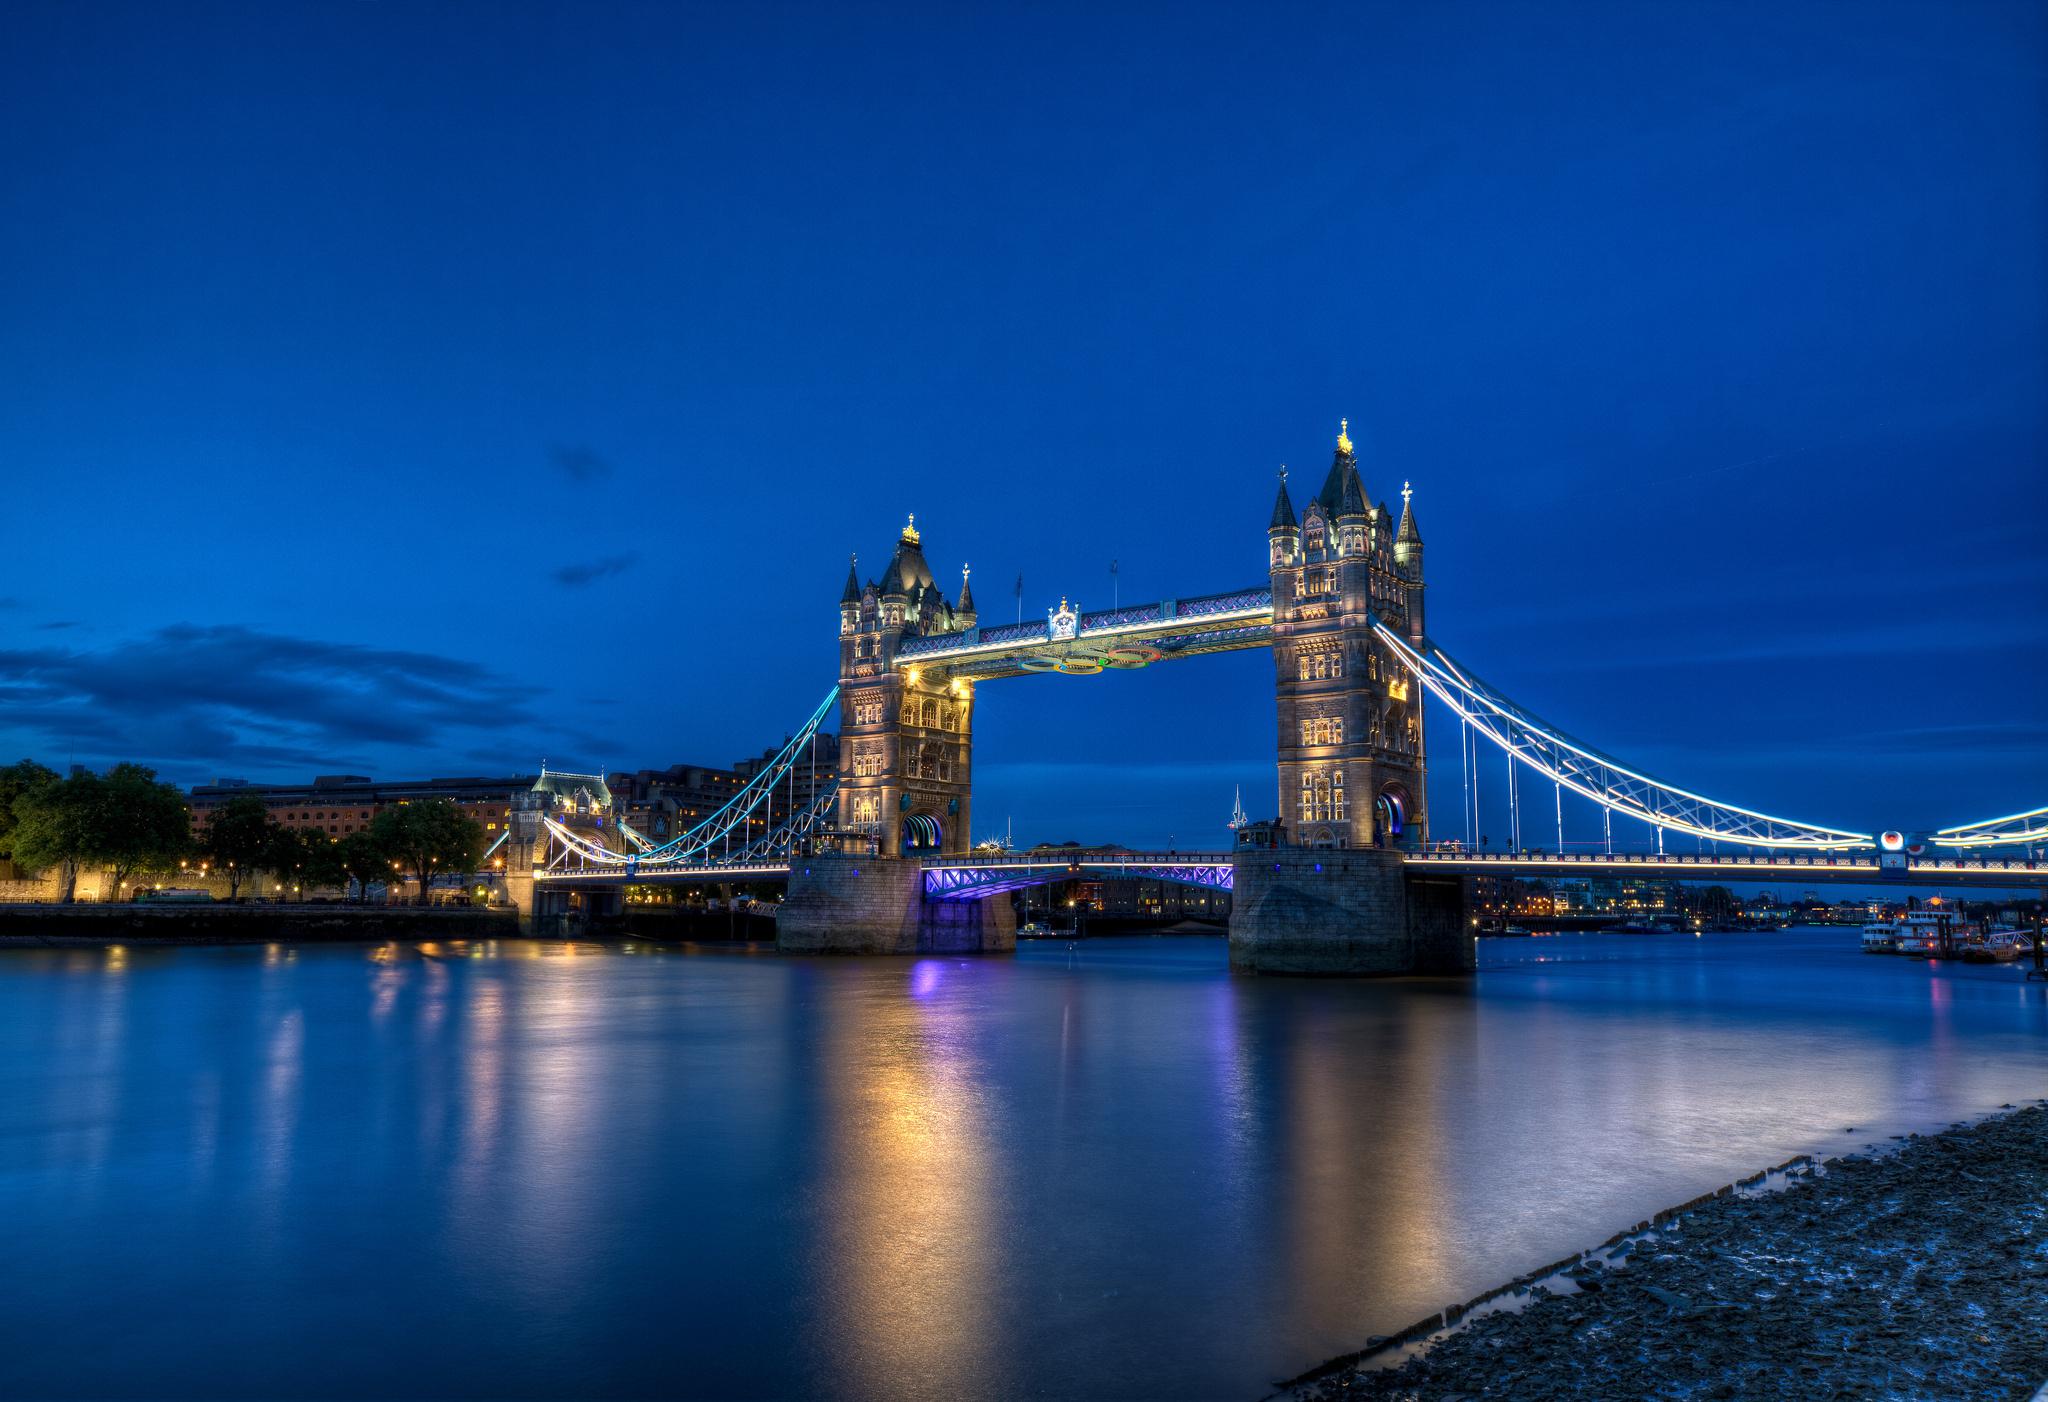 wallpaper bridge london scenic - photo #9